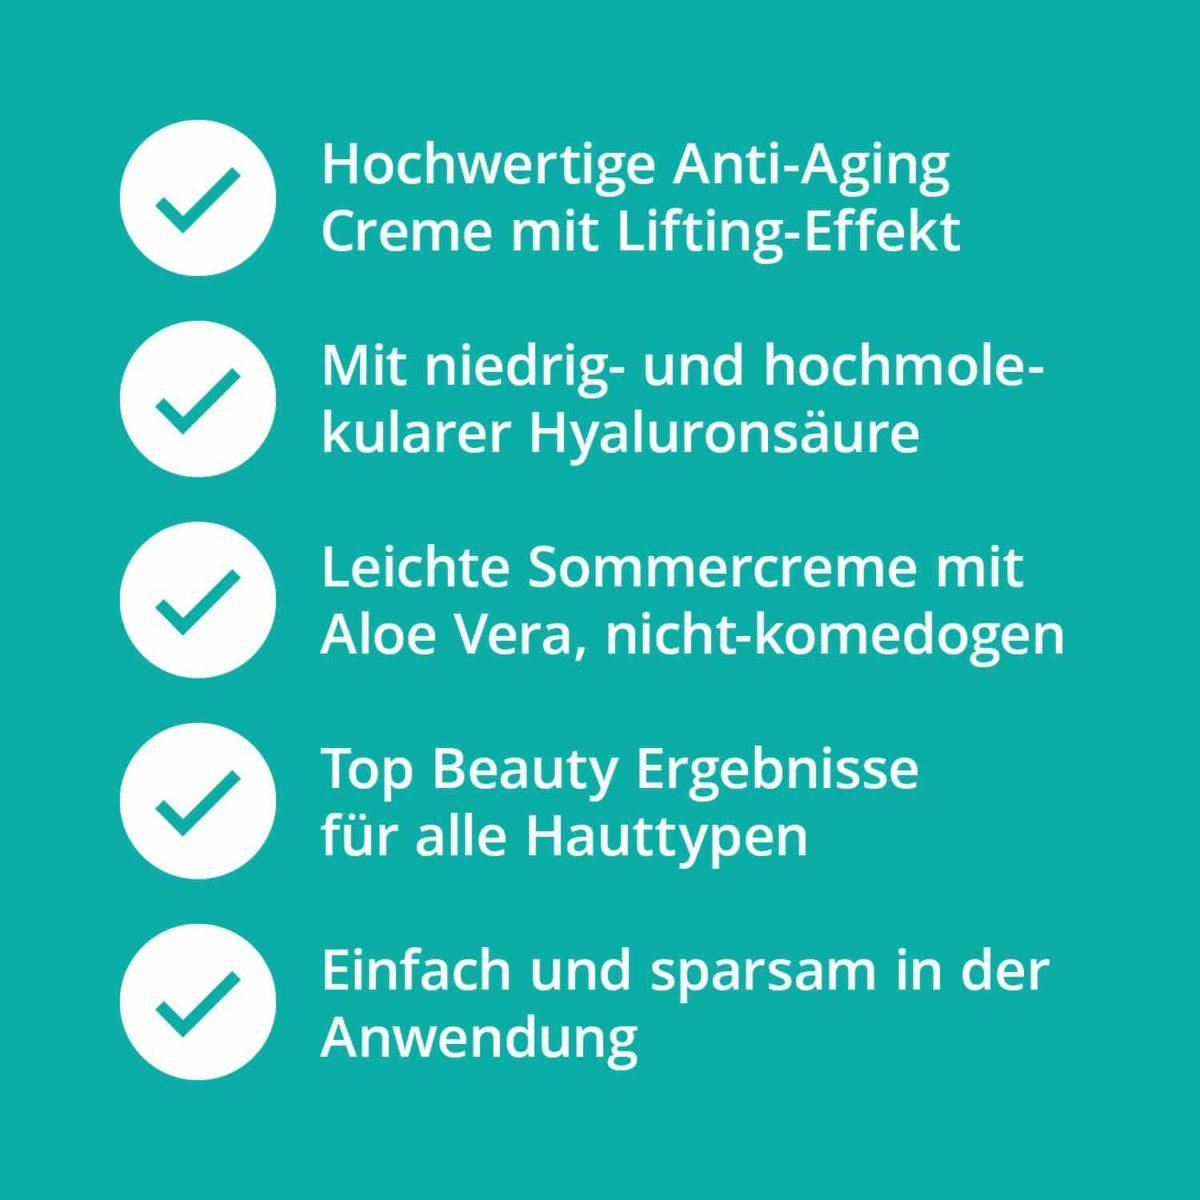 Casida Hyaluronic Acid Lift Cream with Aloe Vera 50 ml 16813082 PZN Apotheke Sommercreme Hyaluronsäure nicht-komedogen7